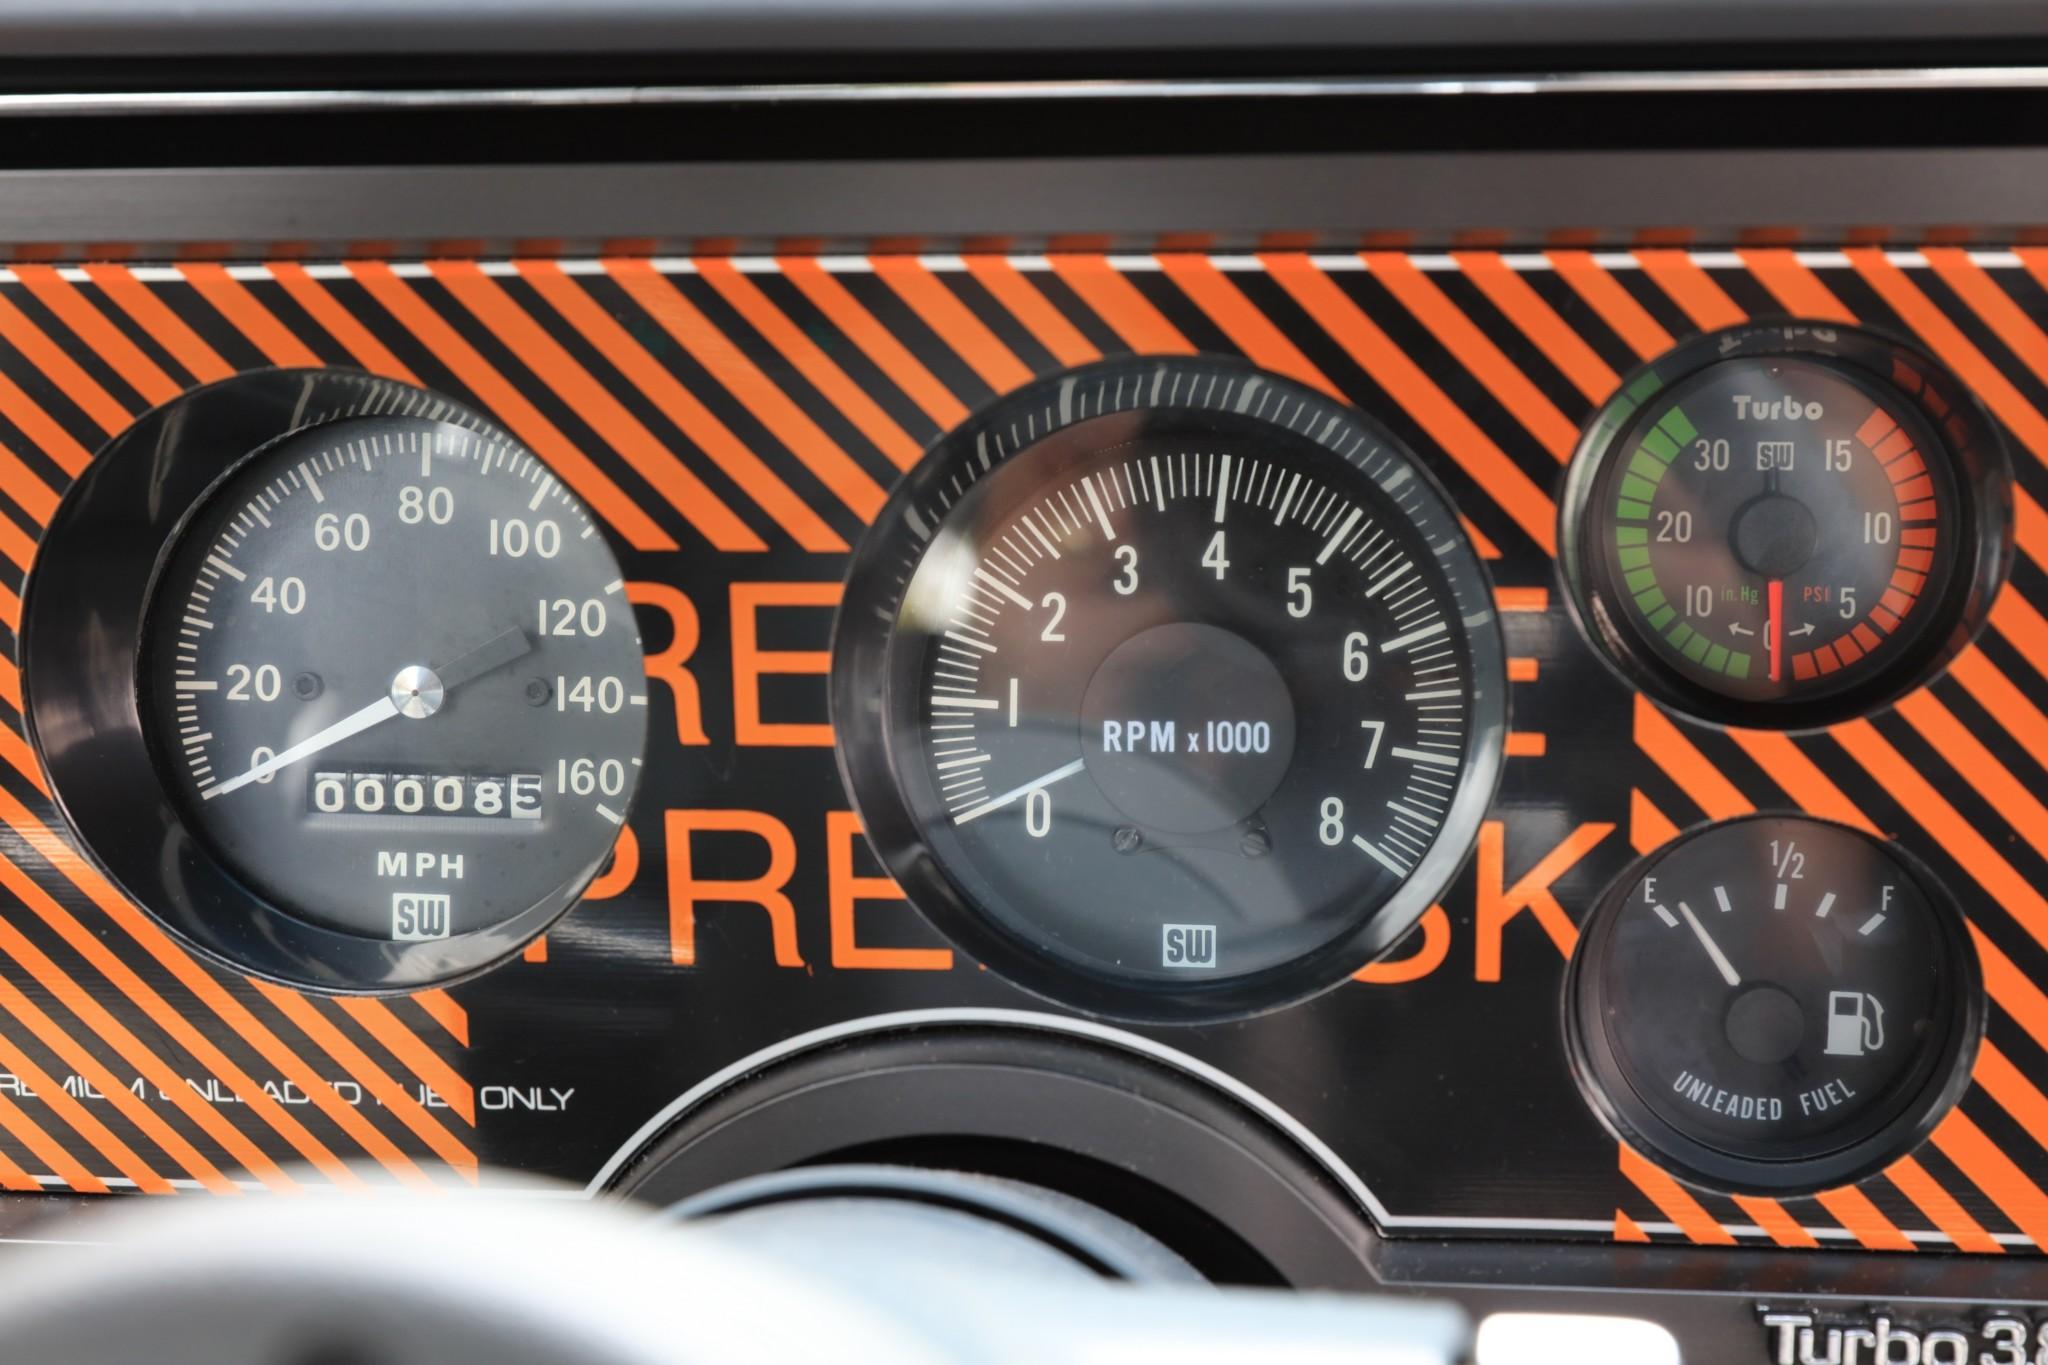 1987 Buick GNX gauge cluster